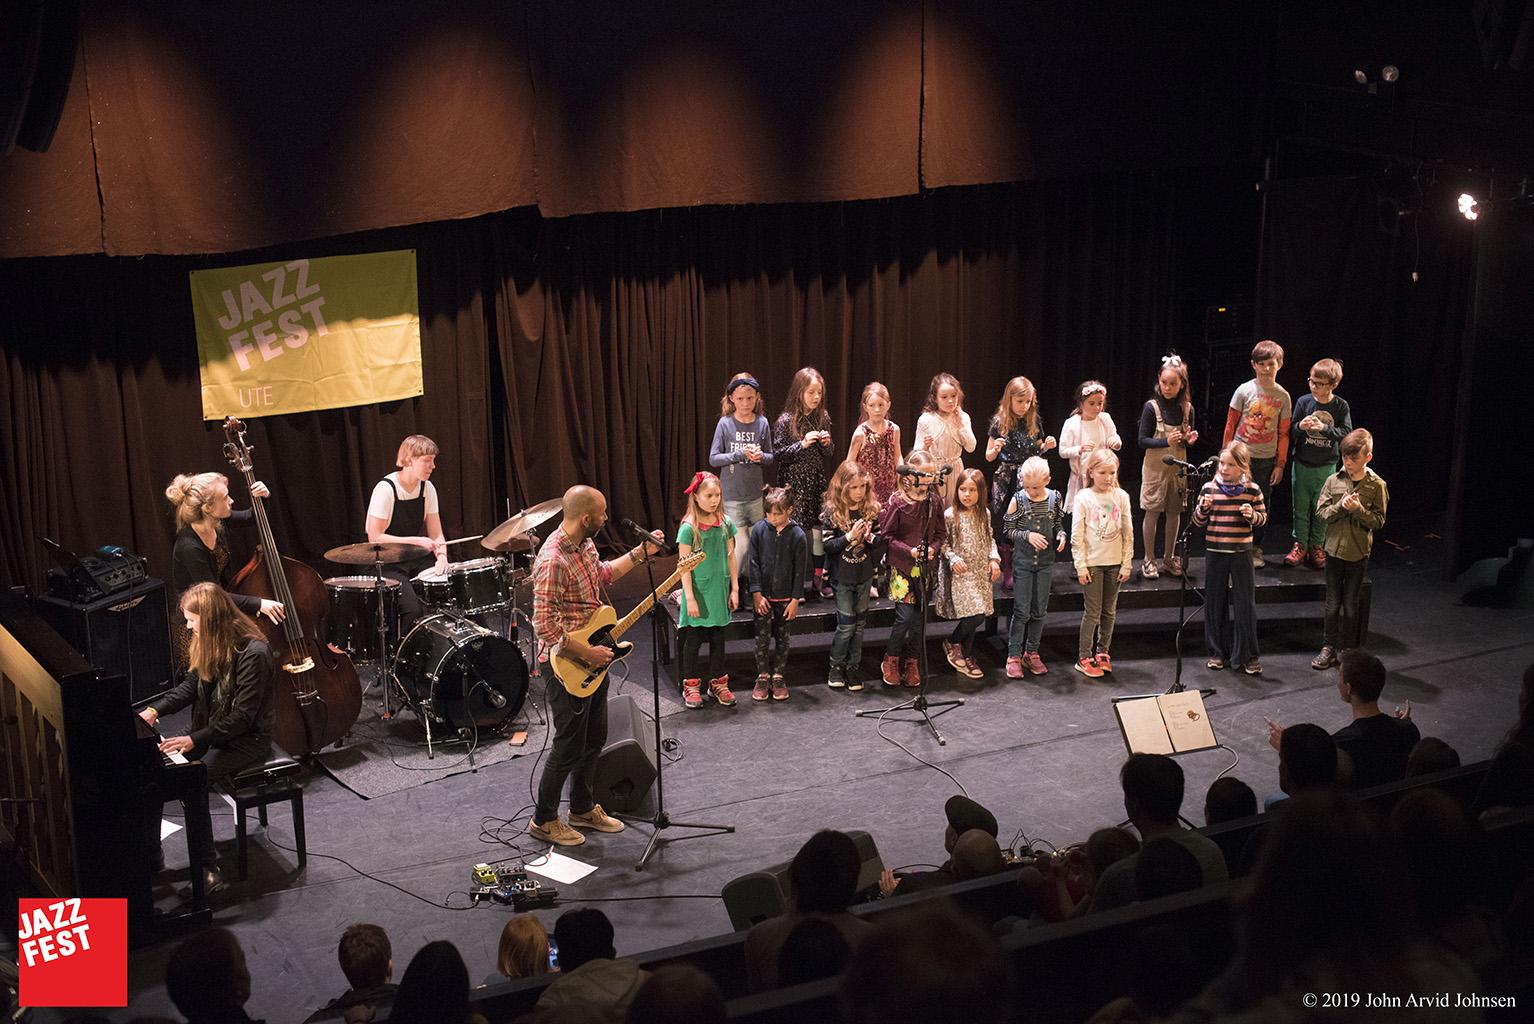 190511 Jazzfest Ung @ Isak Kultursenter (foto John Arvid Johnsen) _ 9.jpg